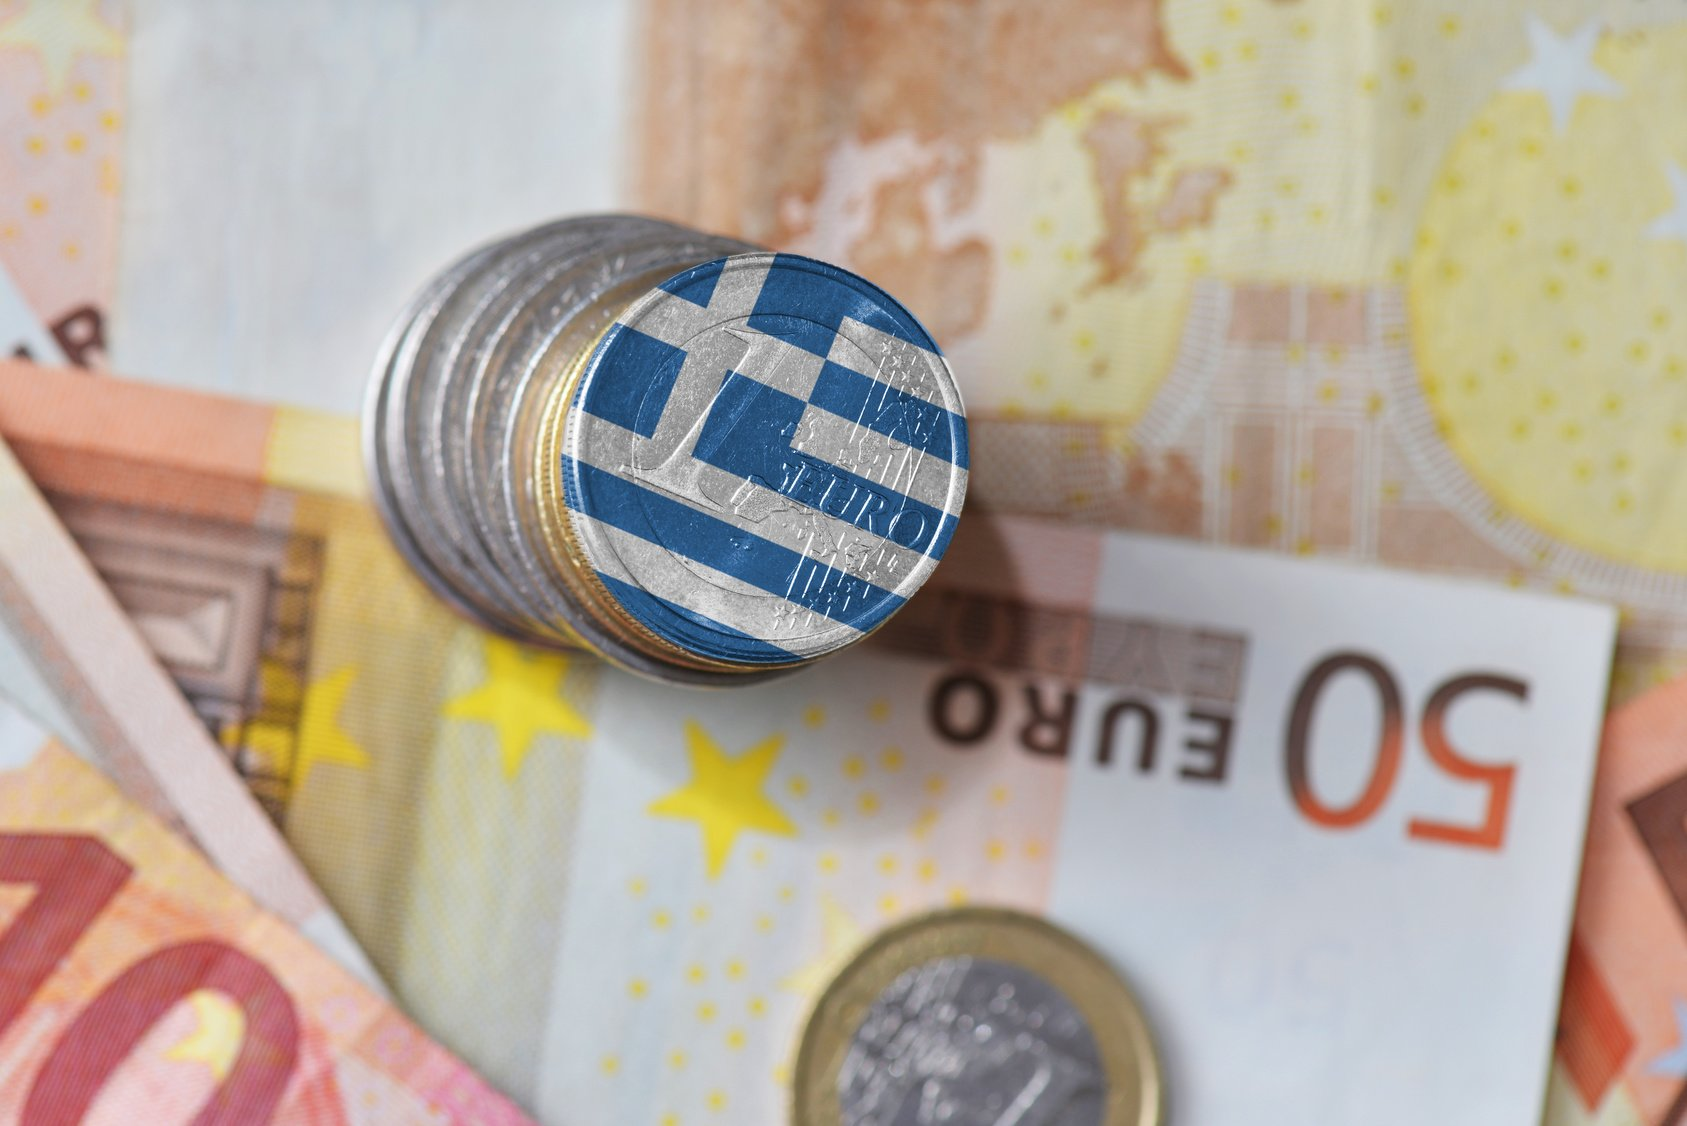 Greece: 2020 recession at 8.2%, according to ELSTAT